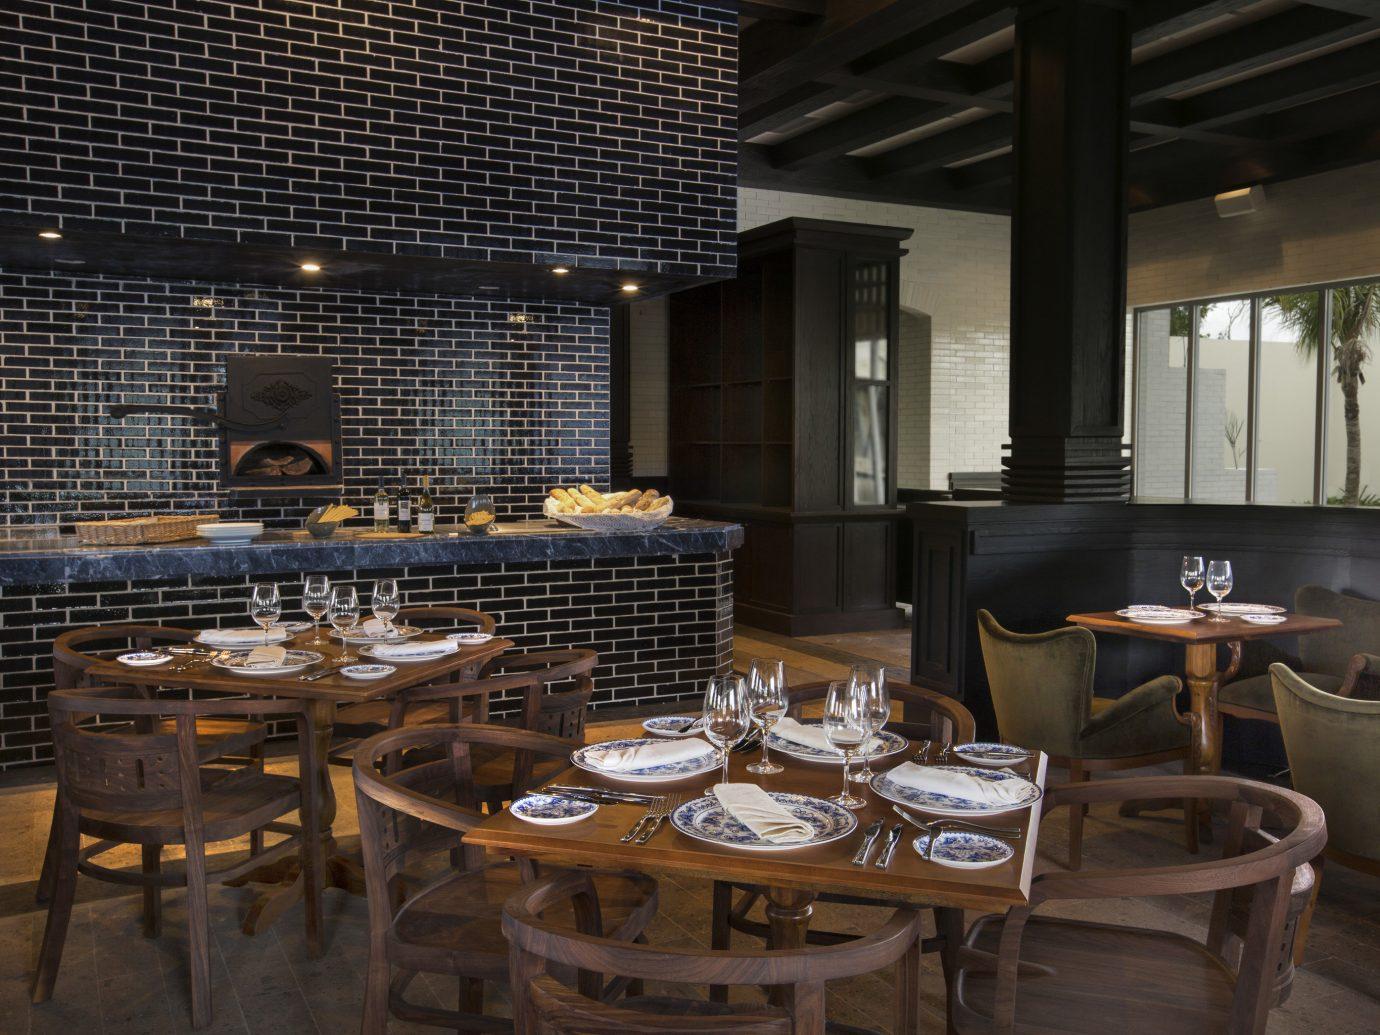 All-Inclusive Resorts Hotels Romance table indoor floor room window chair restaurant dining room meal interior design estate lighting Bar Dining set furniture